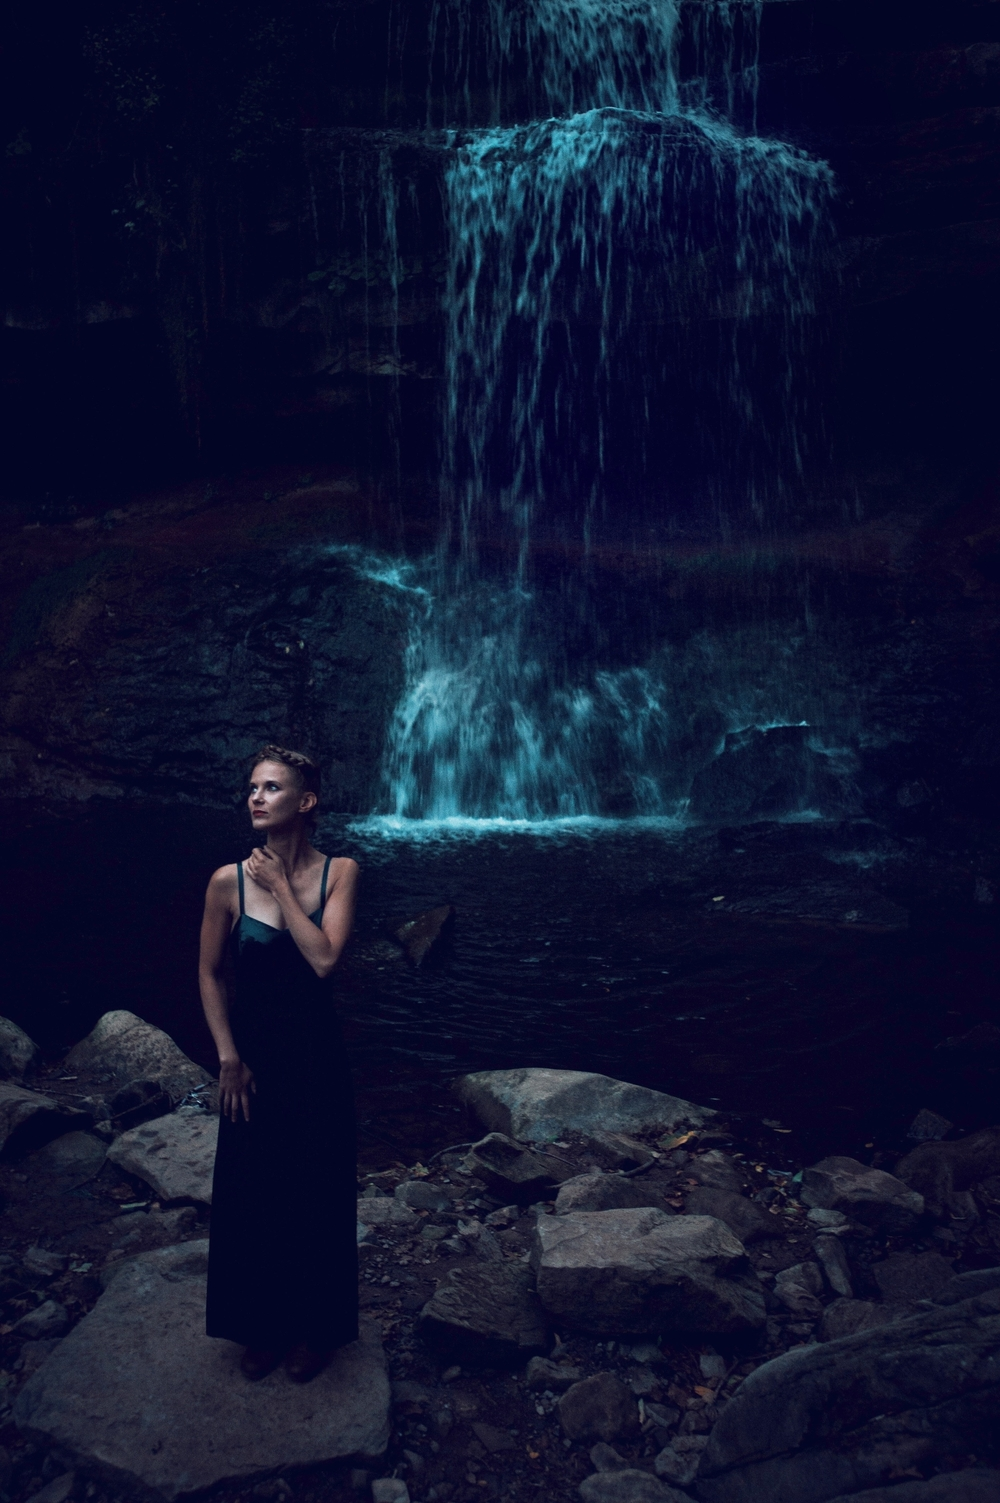 Oph waterfall1.jpg